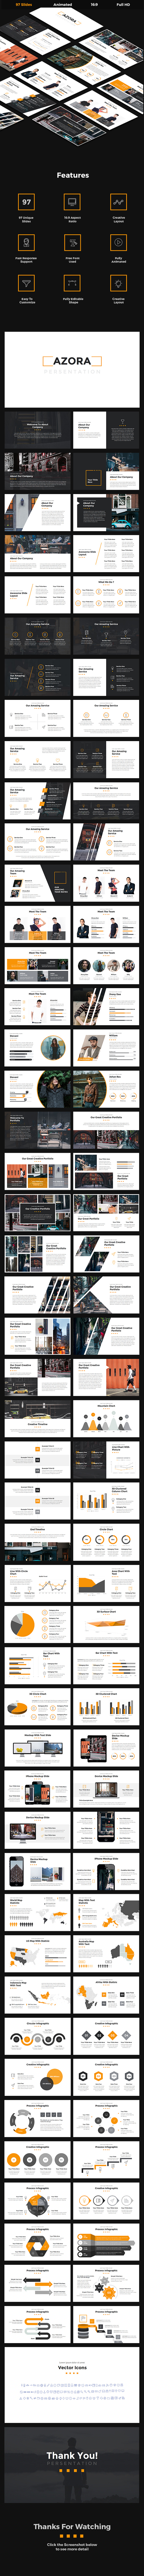 Azora - Creative PowerPoint Template - Creative PowerPoint Templates